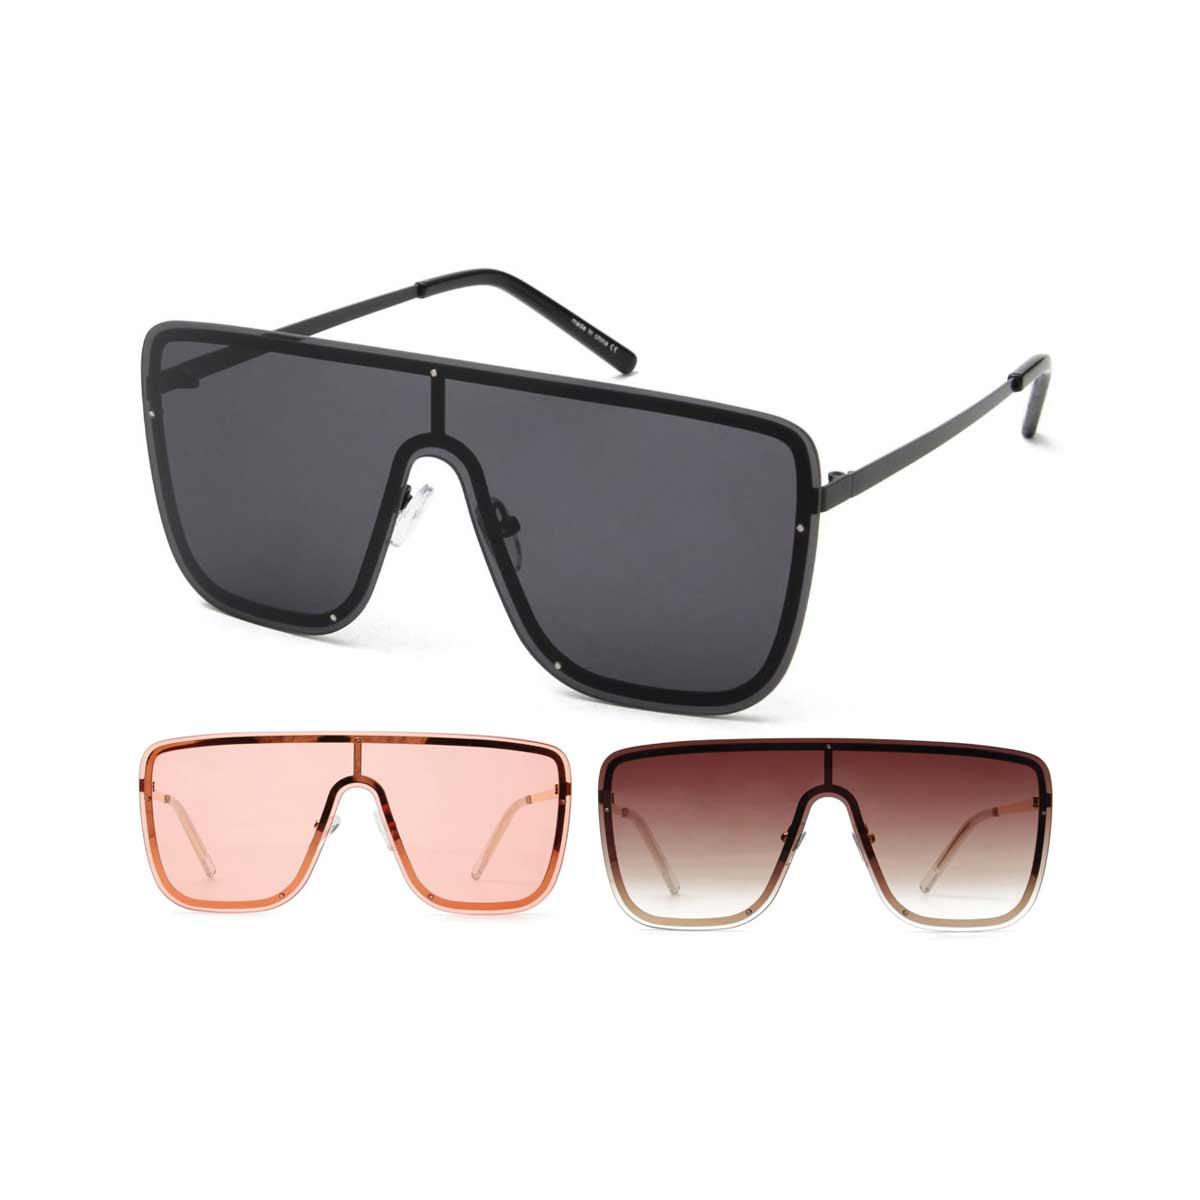 Flat Shield Sunglasses in 3 colors